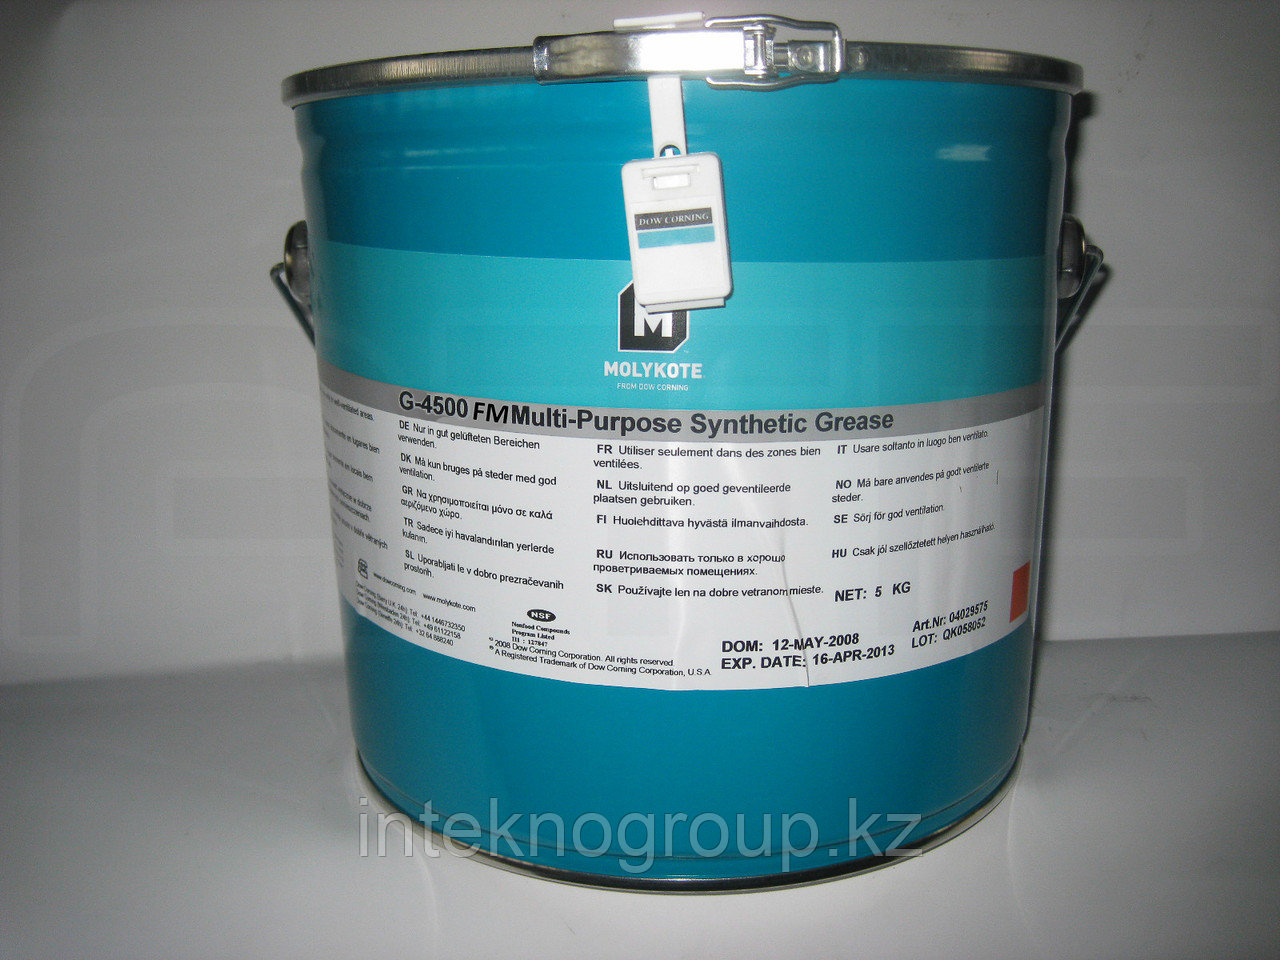 Dow Corning Molykote G-4500 paste 5kg